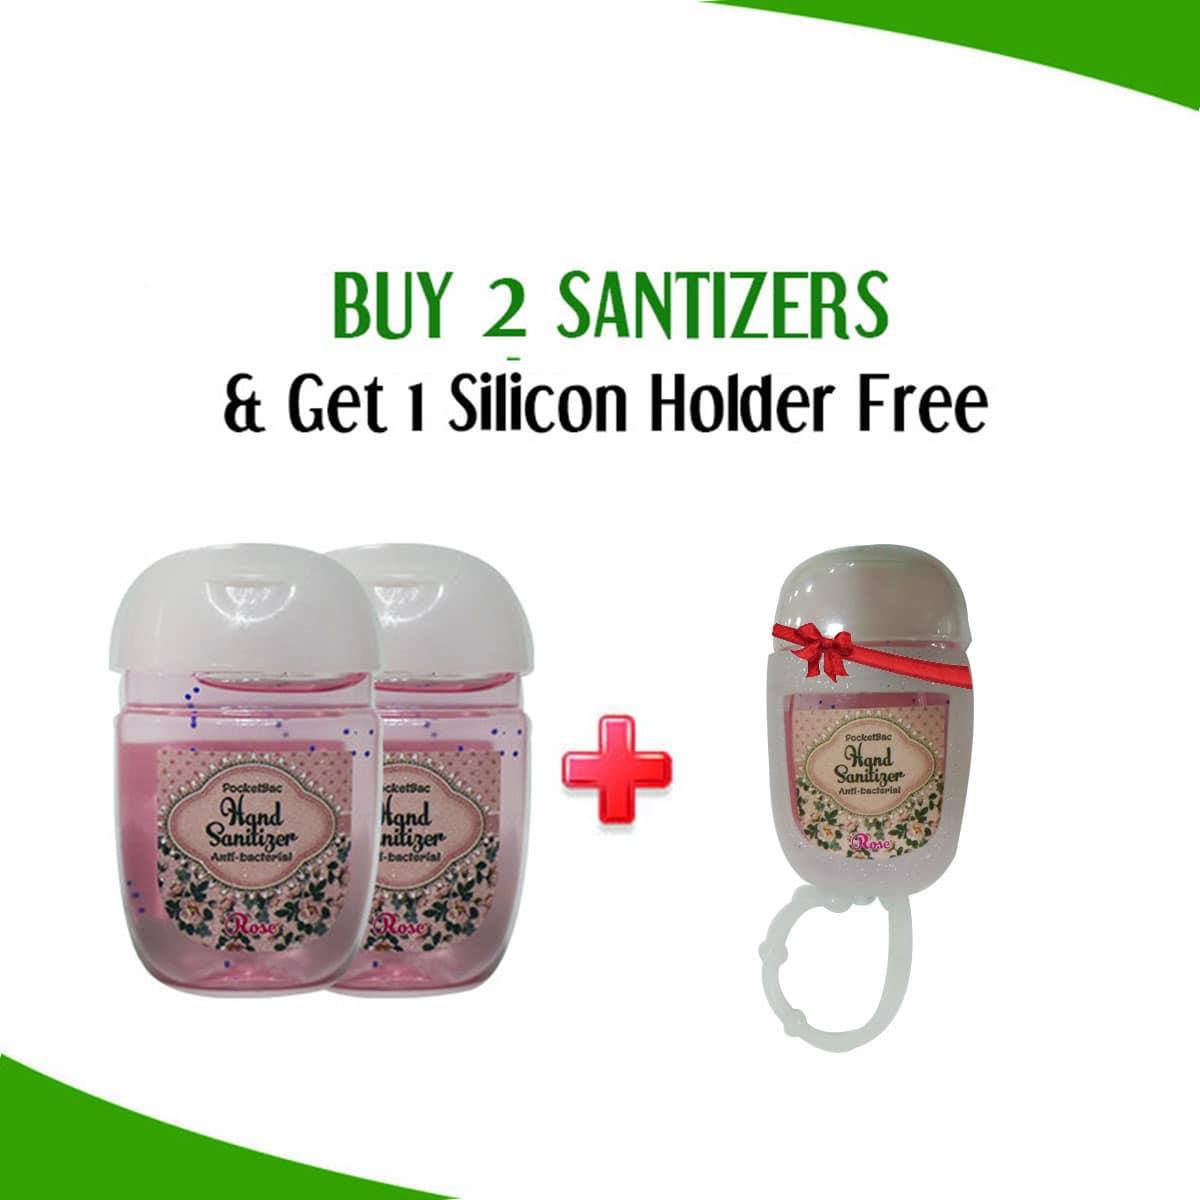 Buy 2 Hand Sanitizer Mini Cute Bottle Get 1 Slicon Holder Free By Karry &  Kare